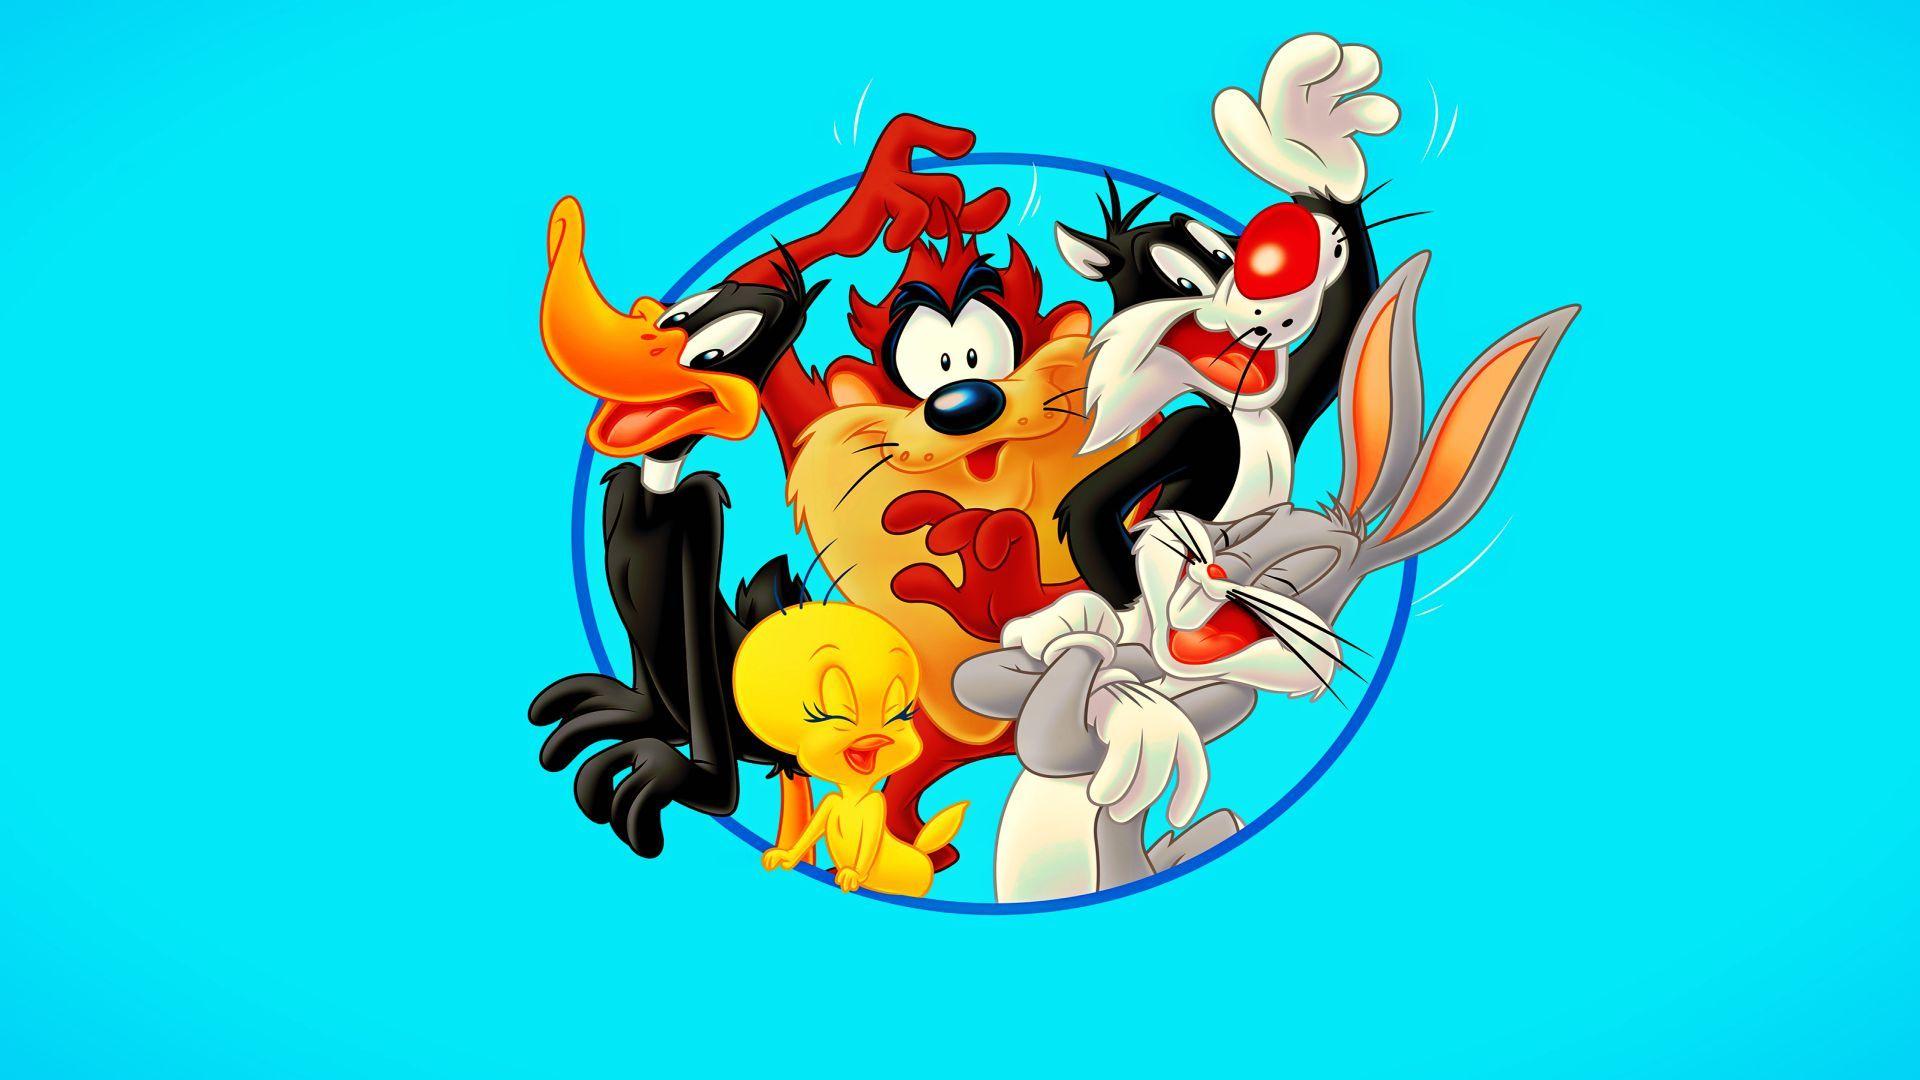 [77+] Looney Tunes Characters Wallpapers on WallpaperSafari